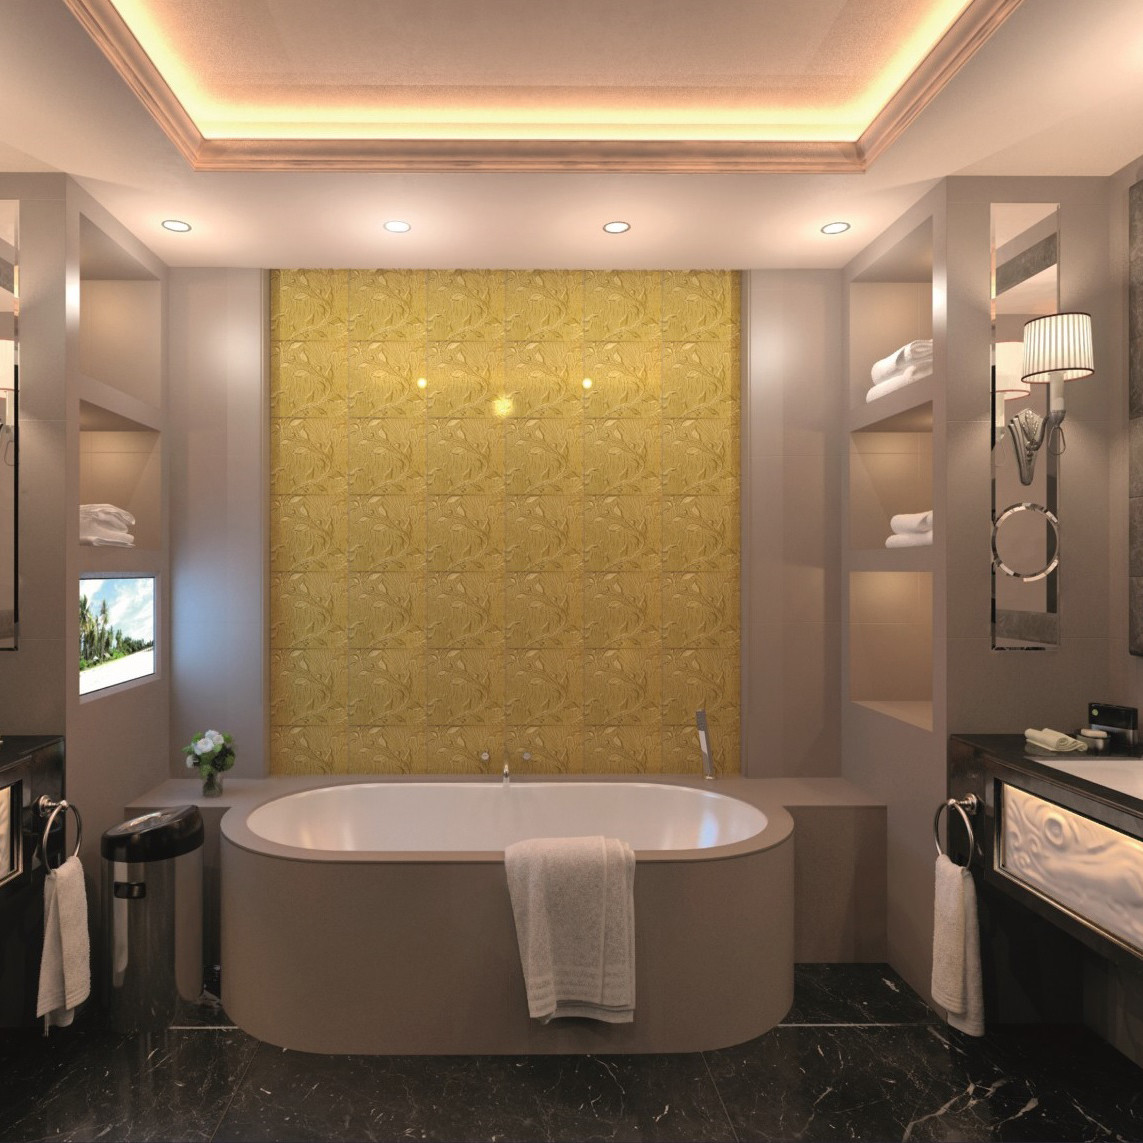 Negarestan Decorative Tiles